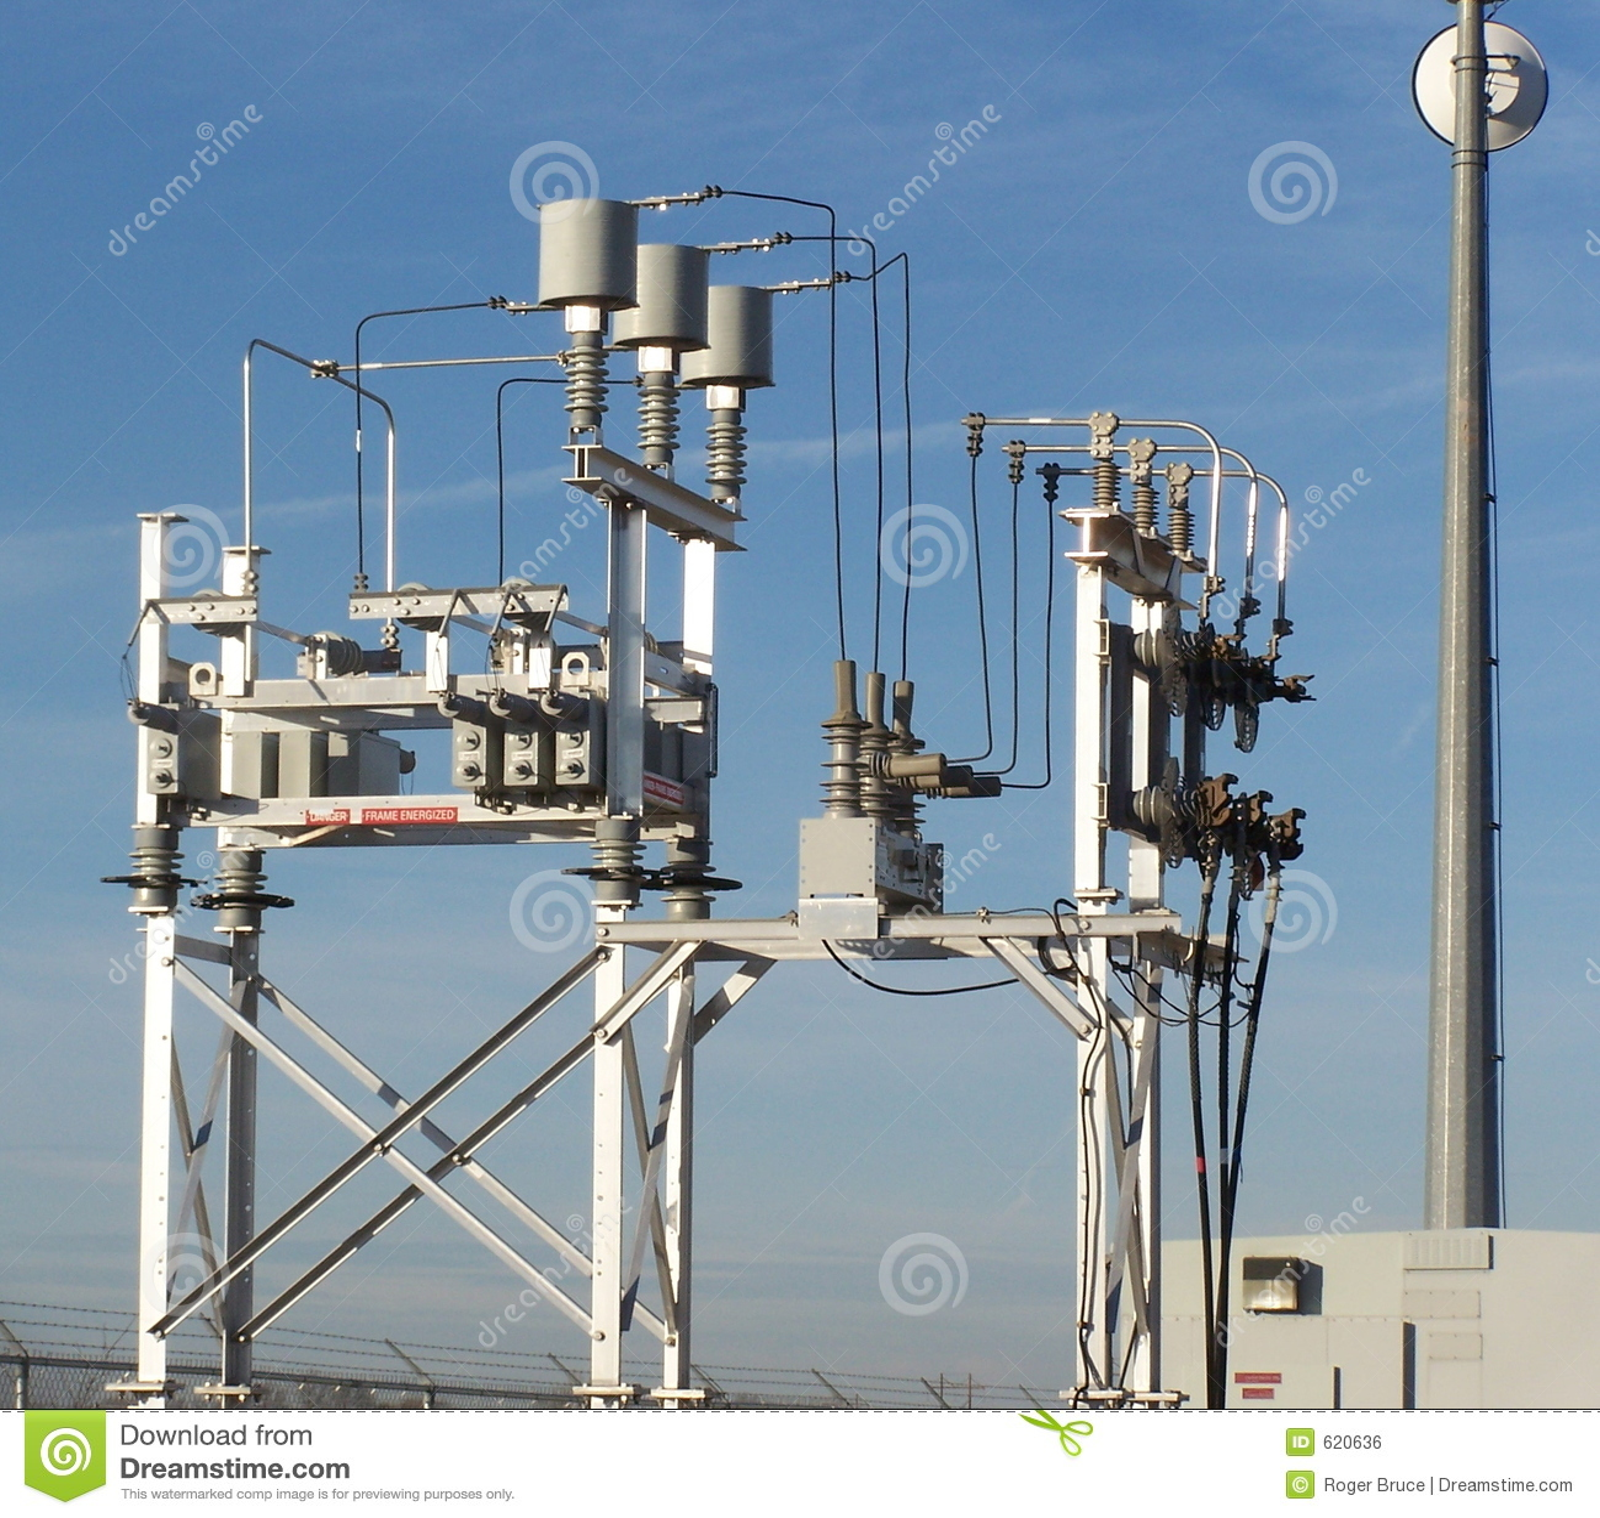 Substation Equipment Stock Photo Image Of Transformer